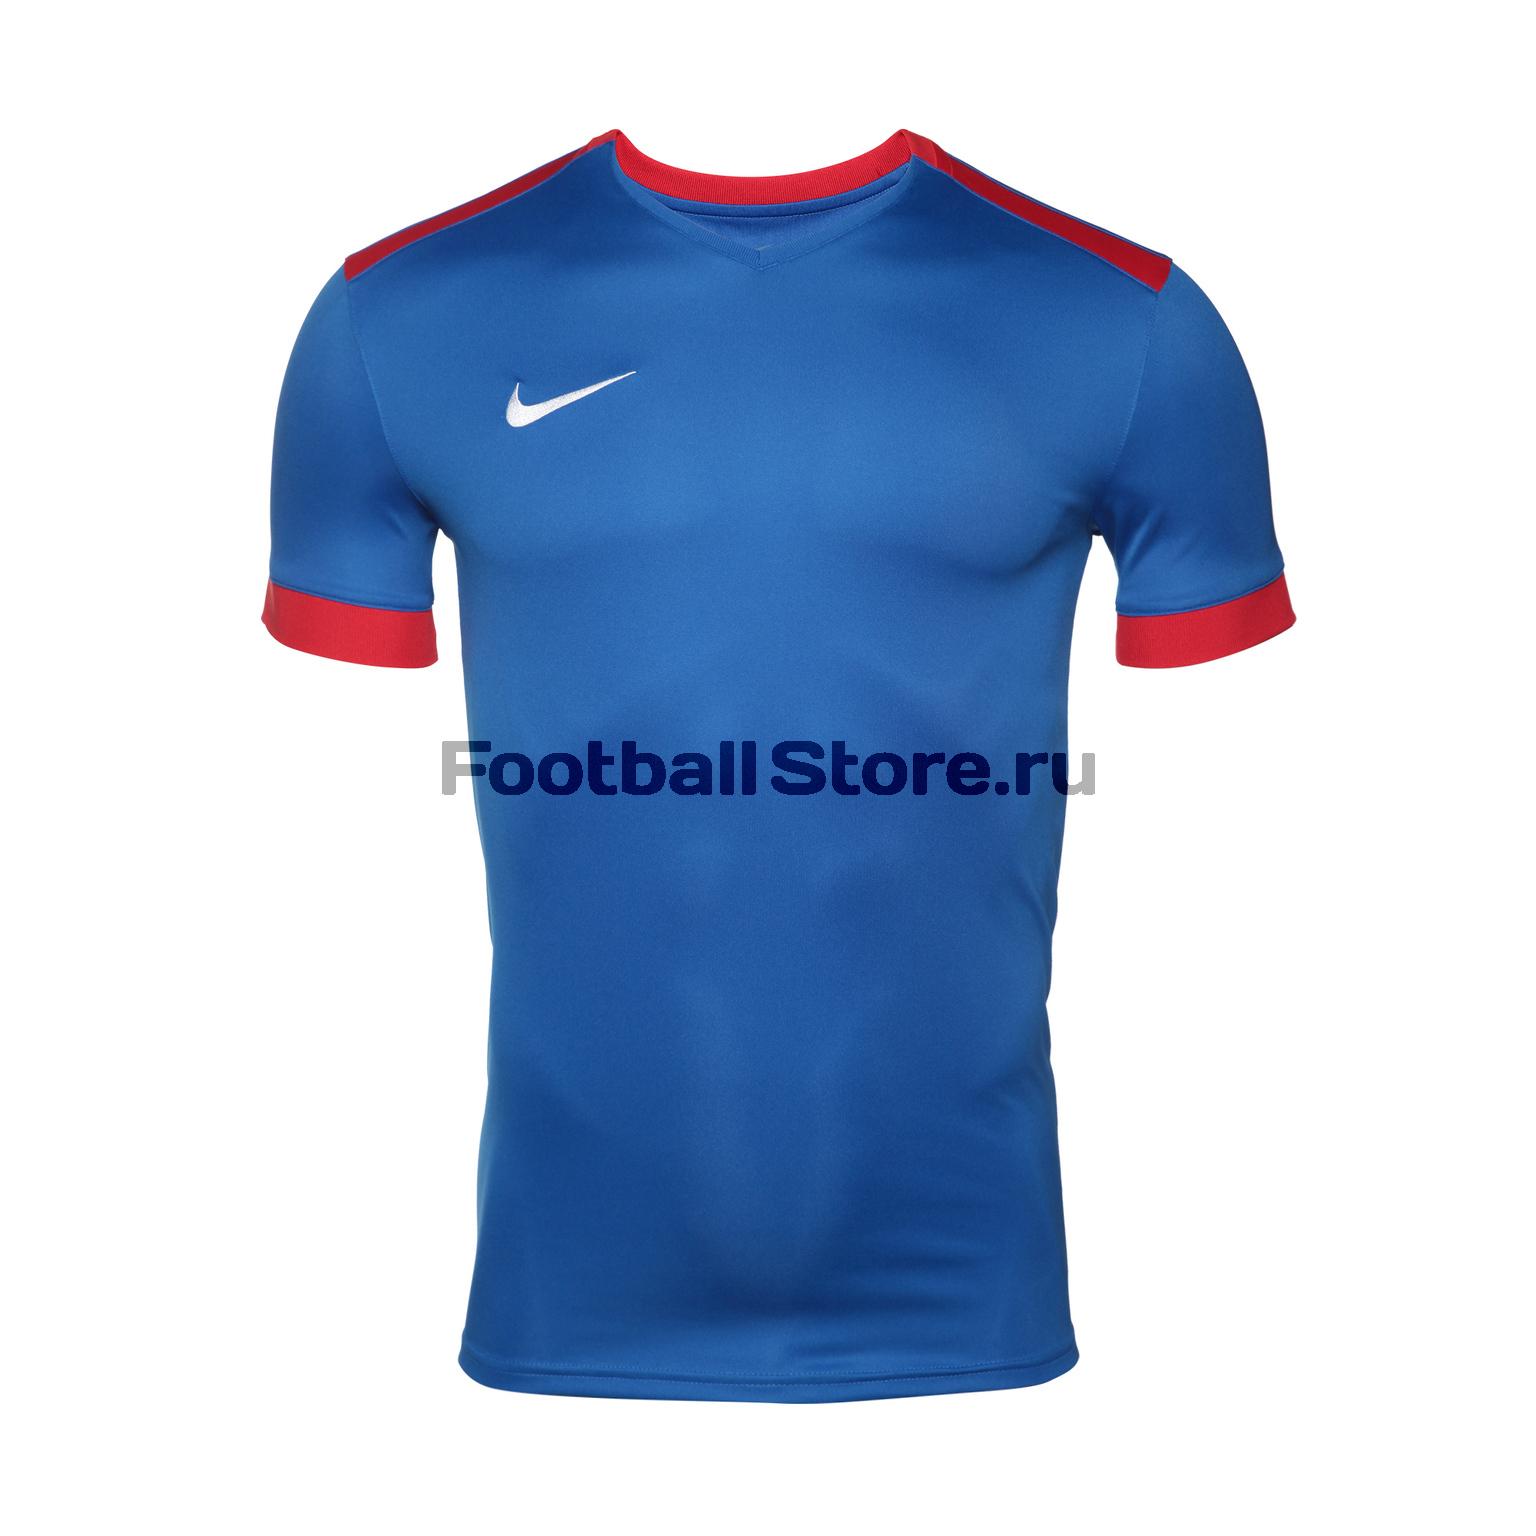 Футболка игровая Nike Park Derby II JSY SS 894312-463 футболка игровая nike ls park derby jsy 588414 106